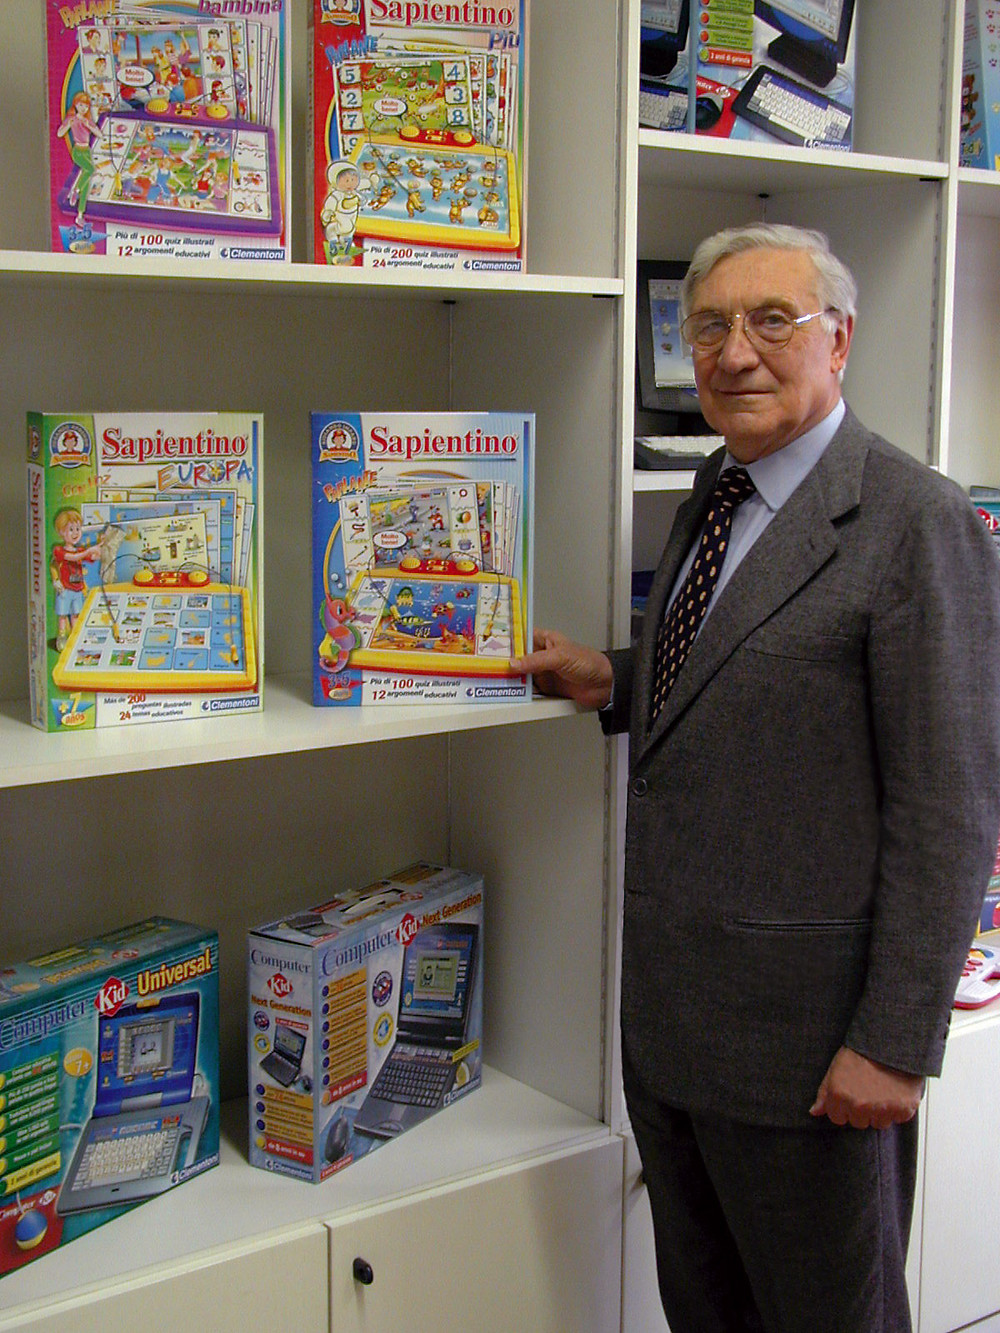 clementoni_sapientino_gioco_educativo